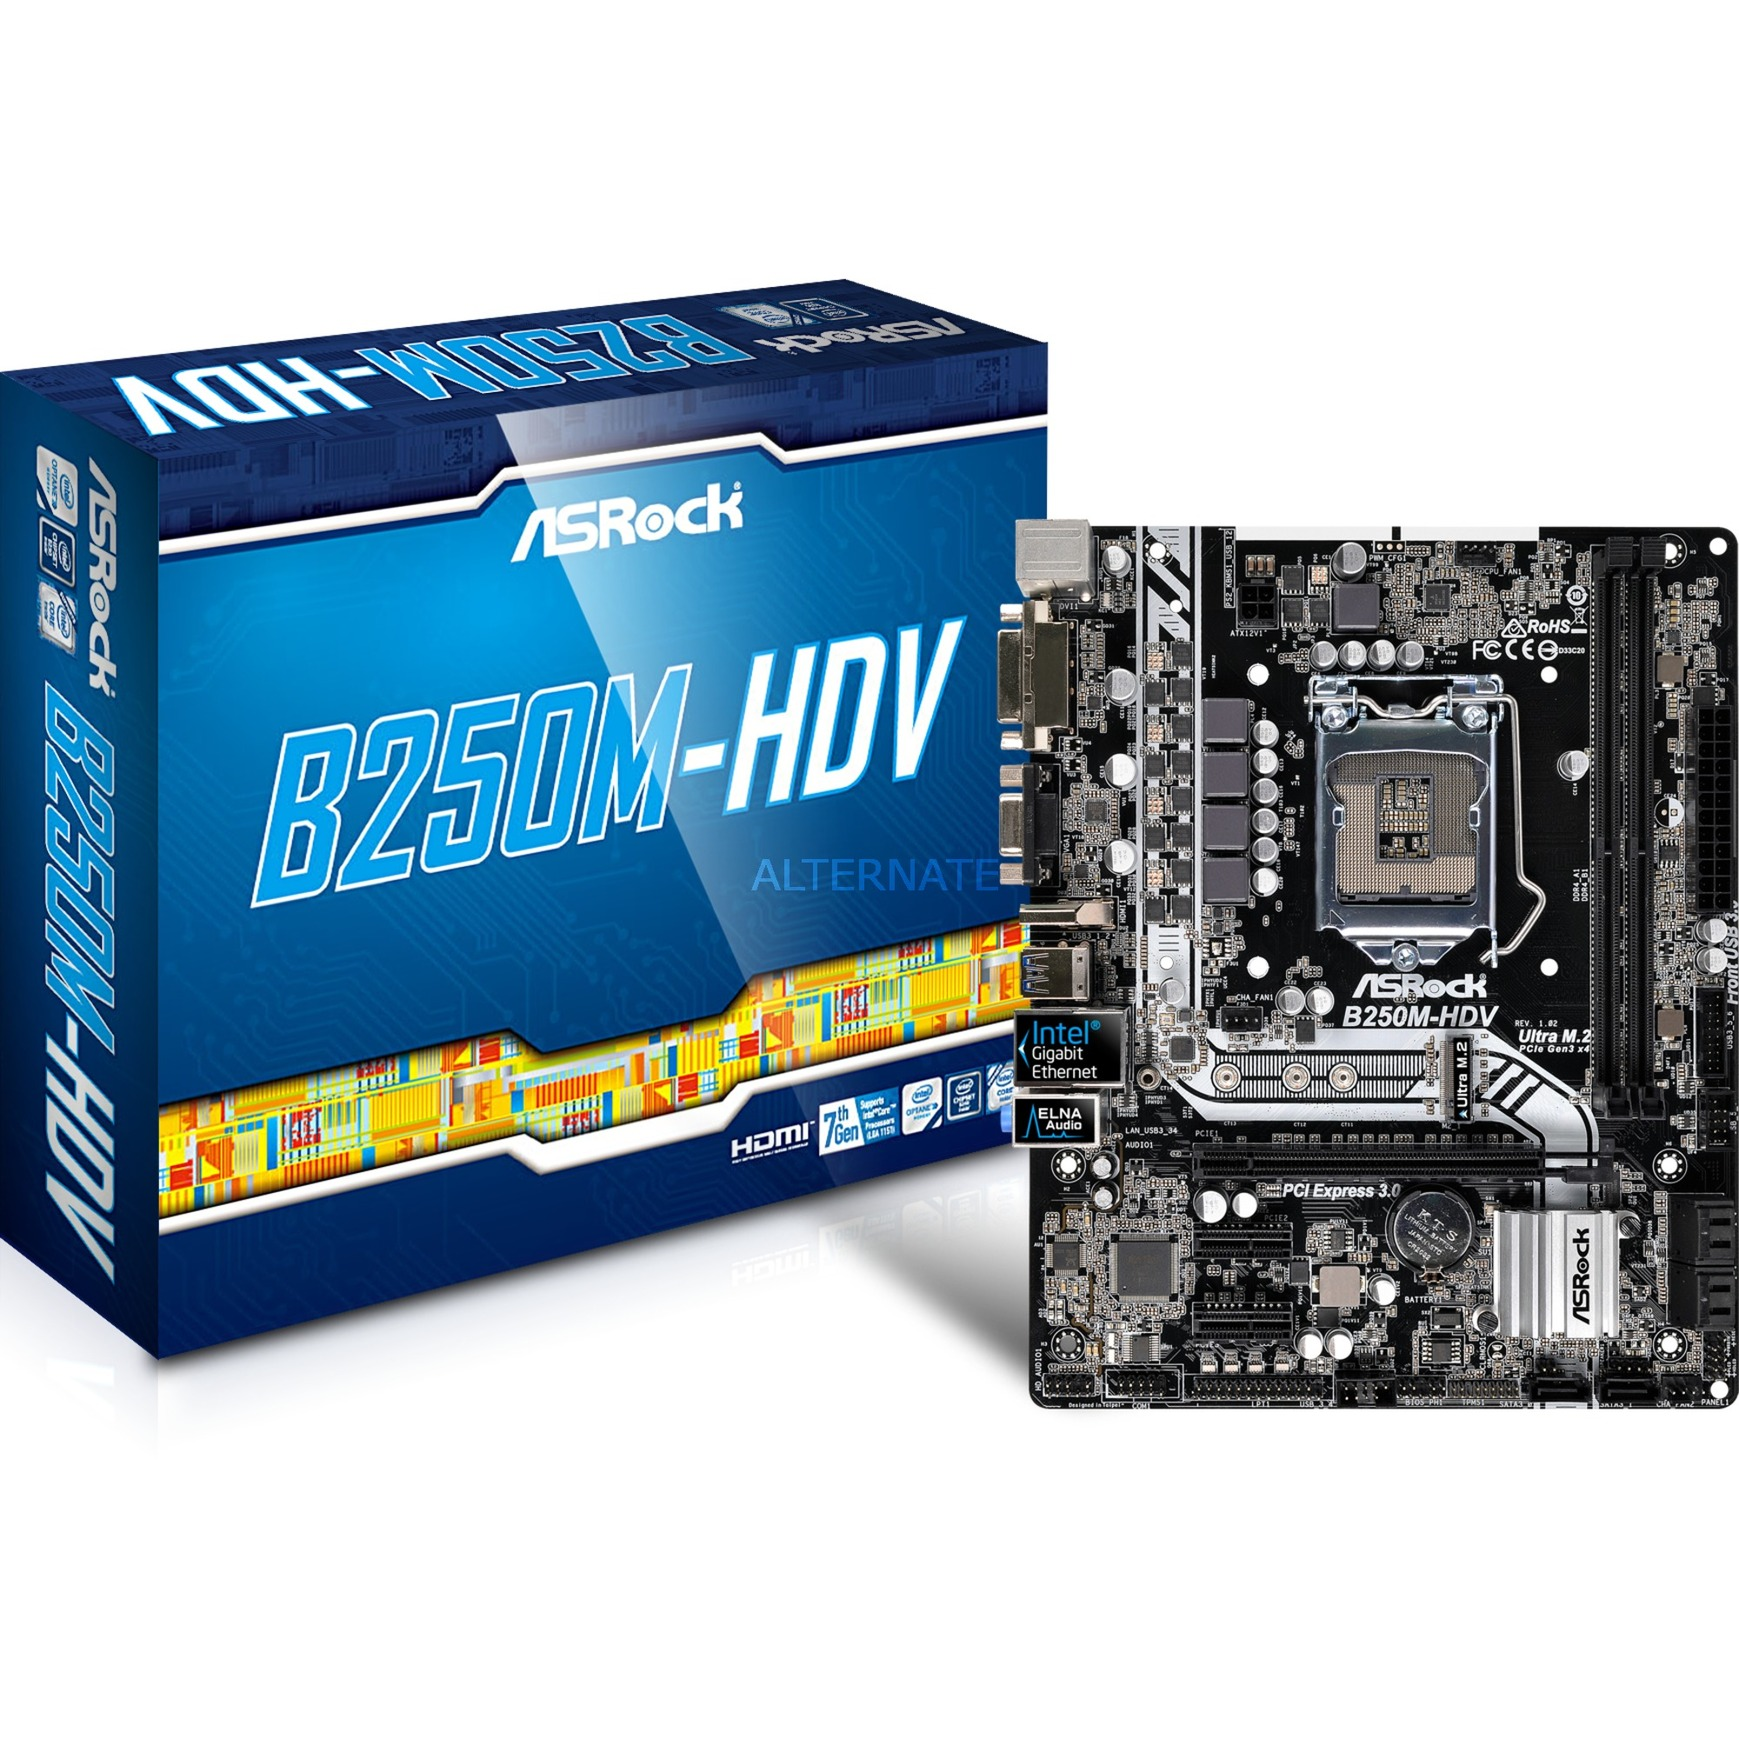 B250M-HDV Intel B250 LGA 1151 (Socket H4) microATX placa base